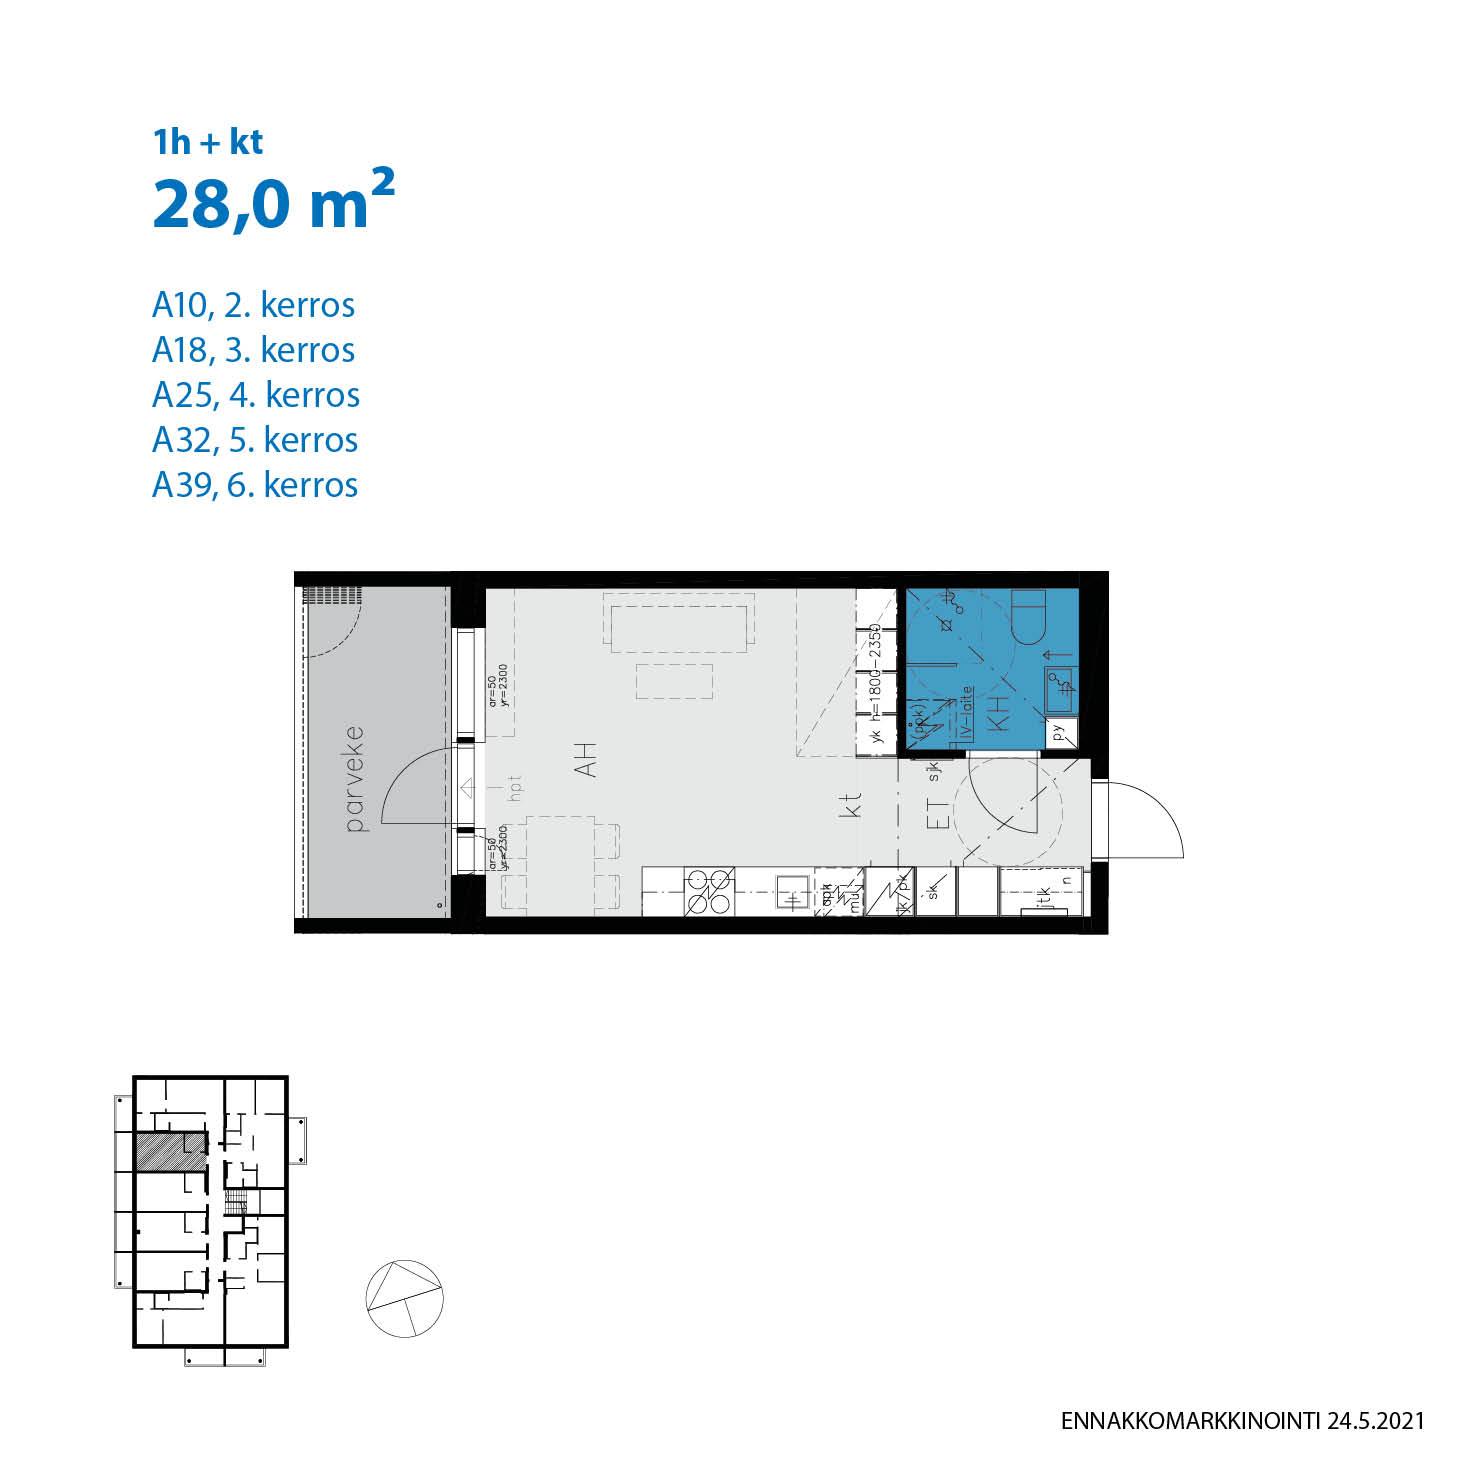 A39, 28.0 m<sup>2</sup>, 1h+kt